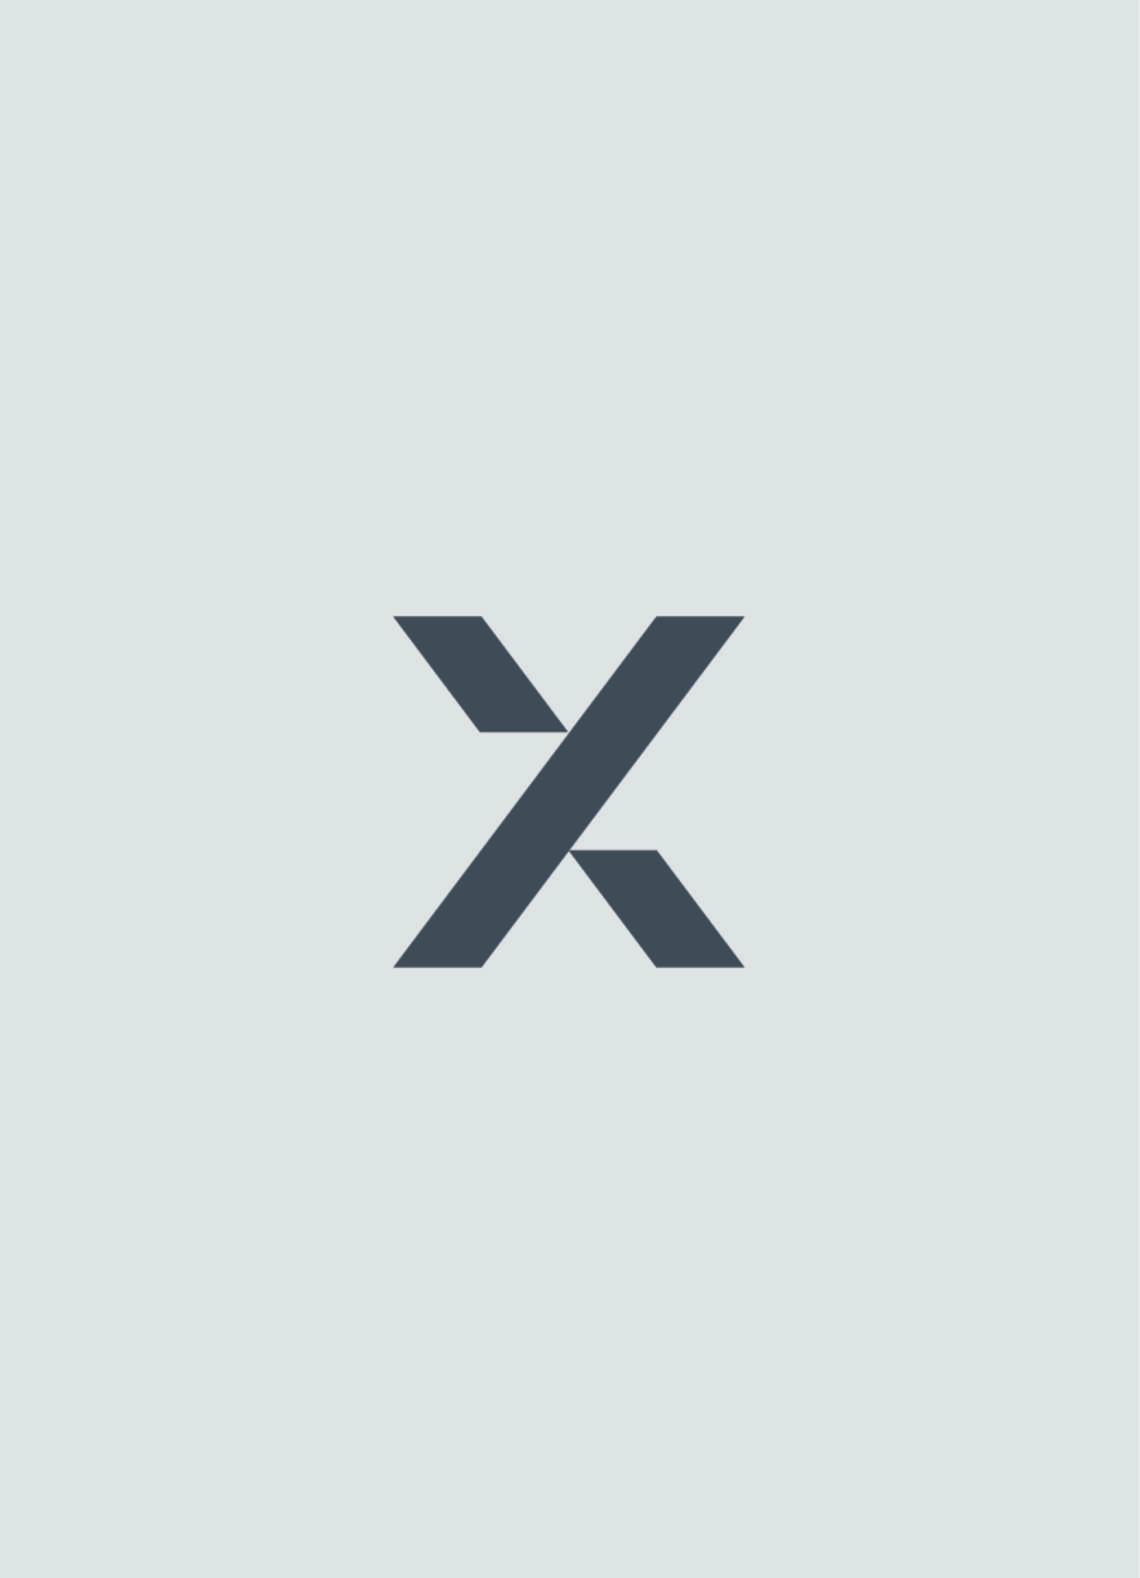 fenix-ntm_138_001.jpg